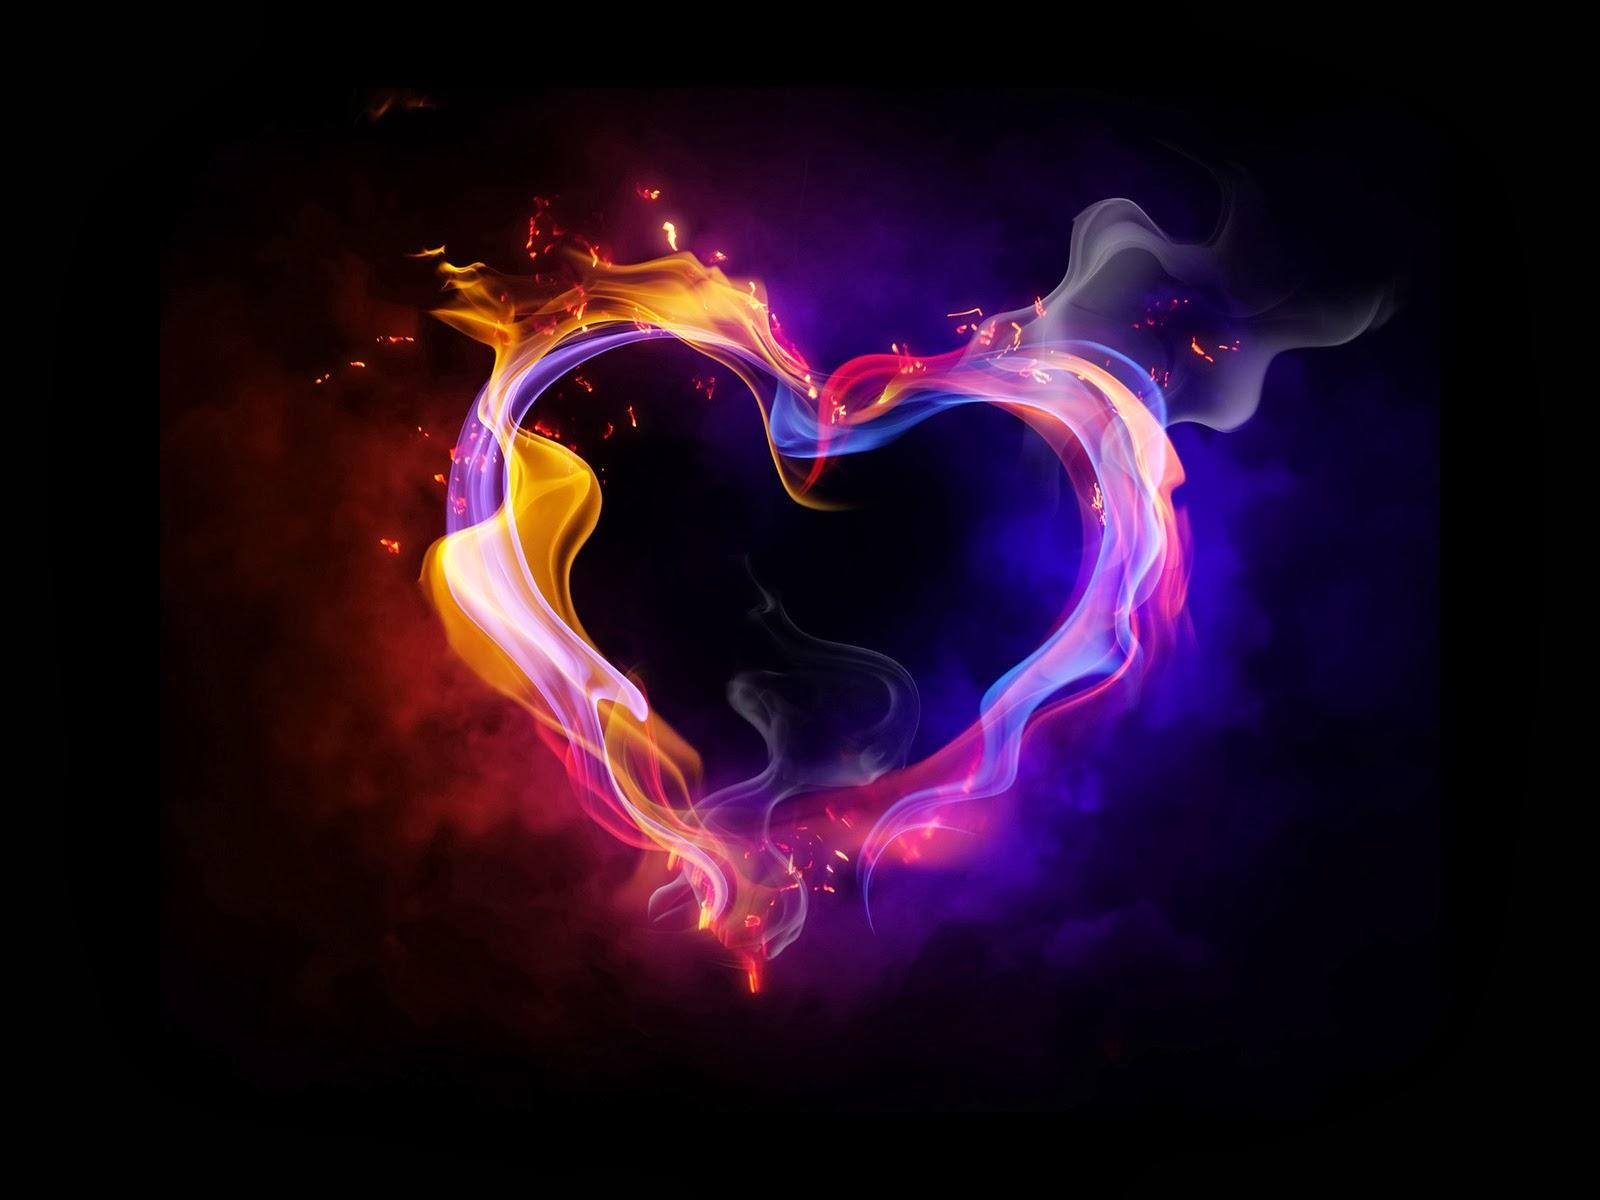 ��� �� ����� ��������� ������ ��� 2016 , Pictures romantic love computer Facebook 2015_1393596474_220.